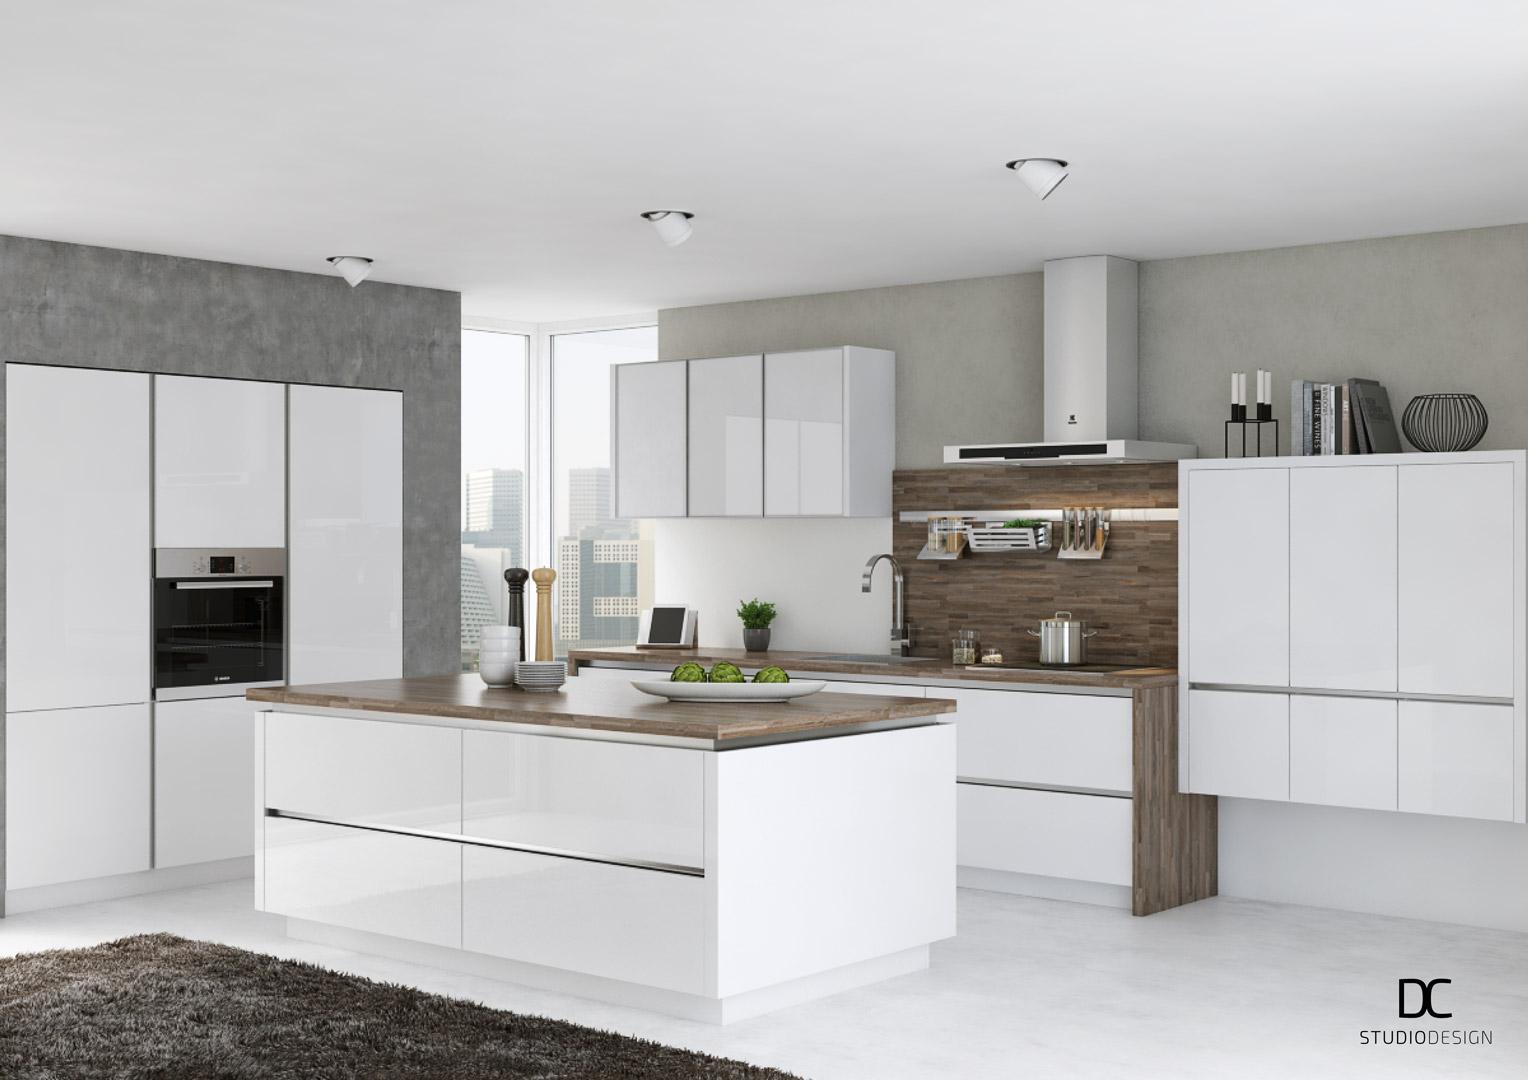 Kitchen handle visualization dc studio design for Kitchen design visualiser